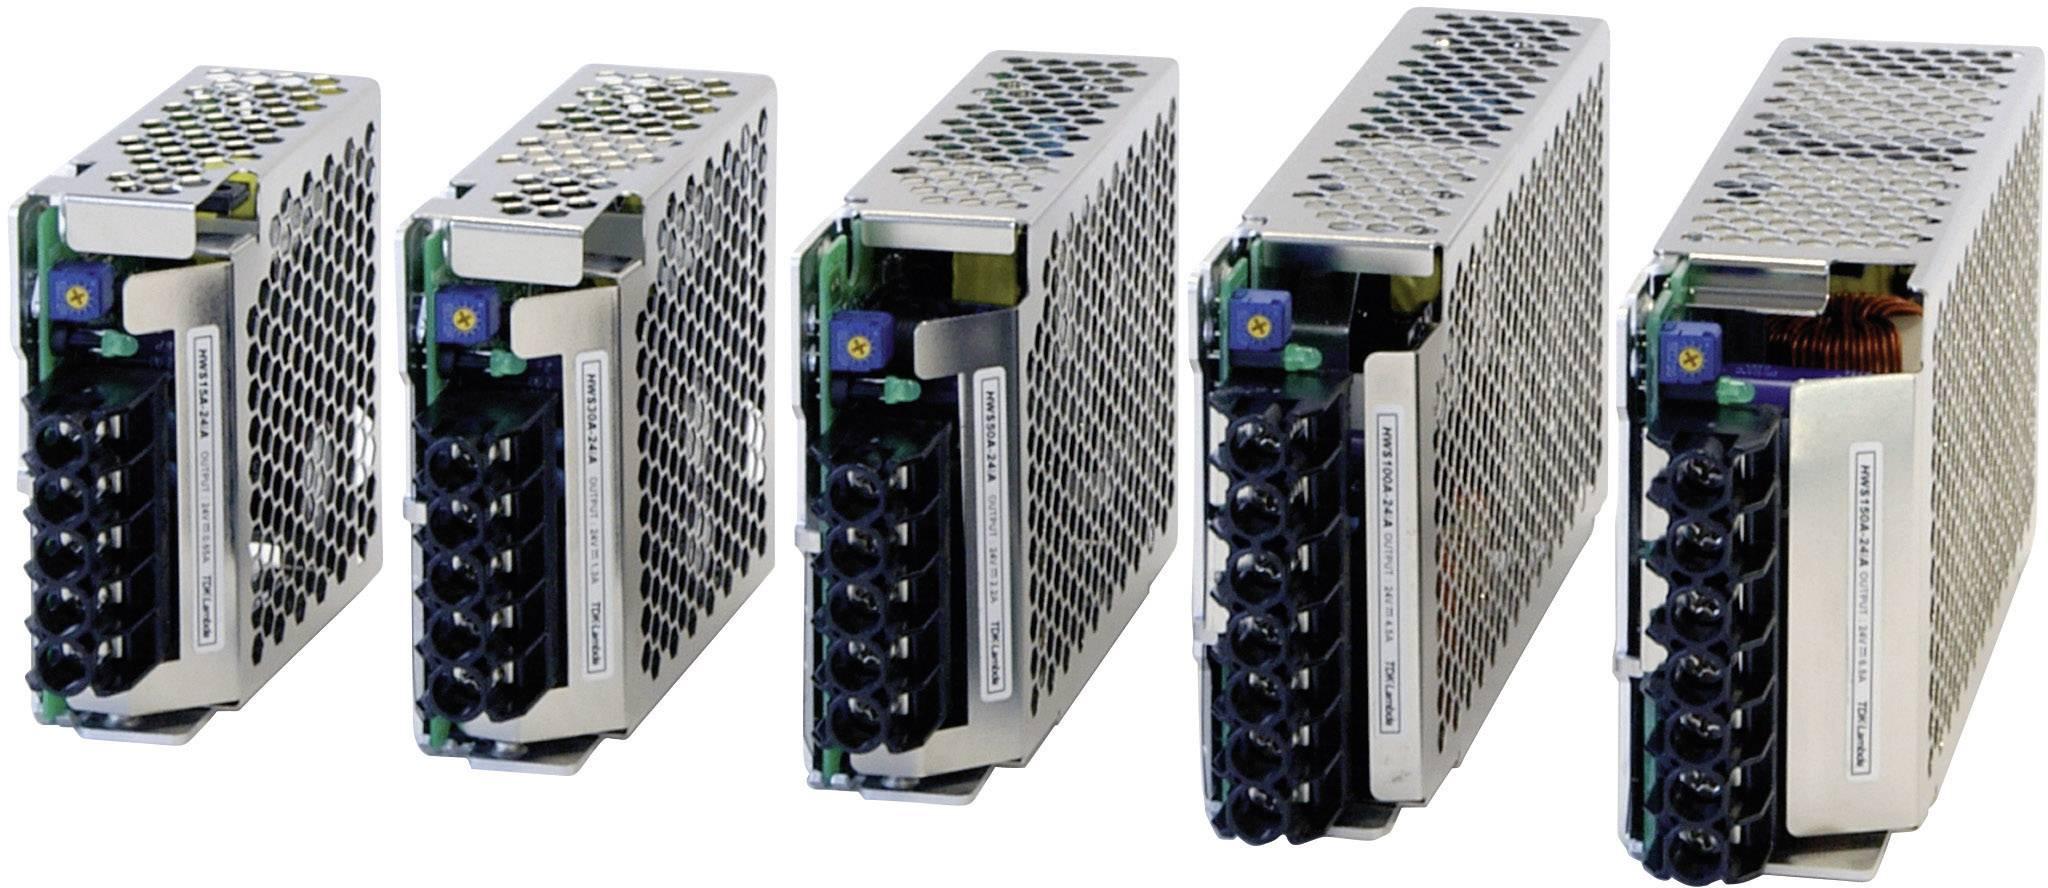 Zabudovateľný napájací zdroj TDK-Lambda HWS-15A-12, 12 V, 15,6 W